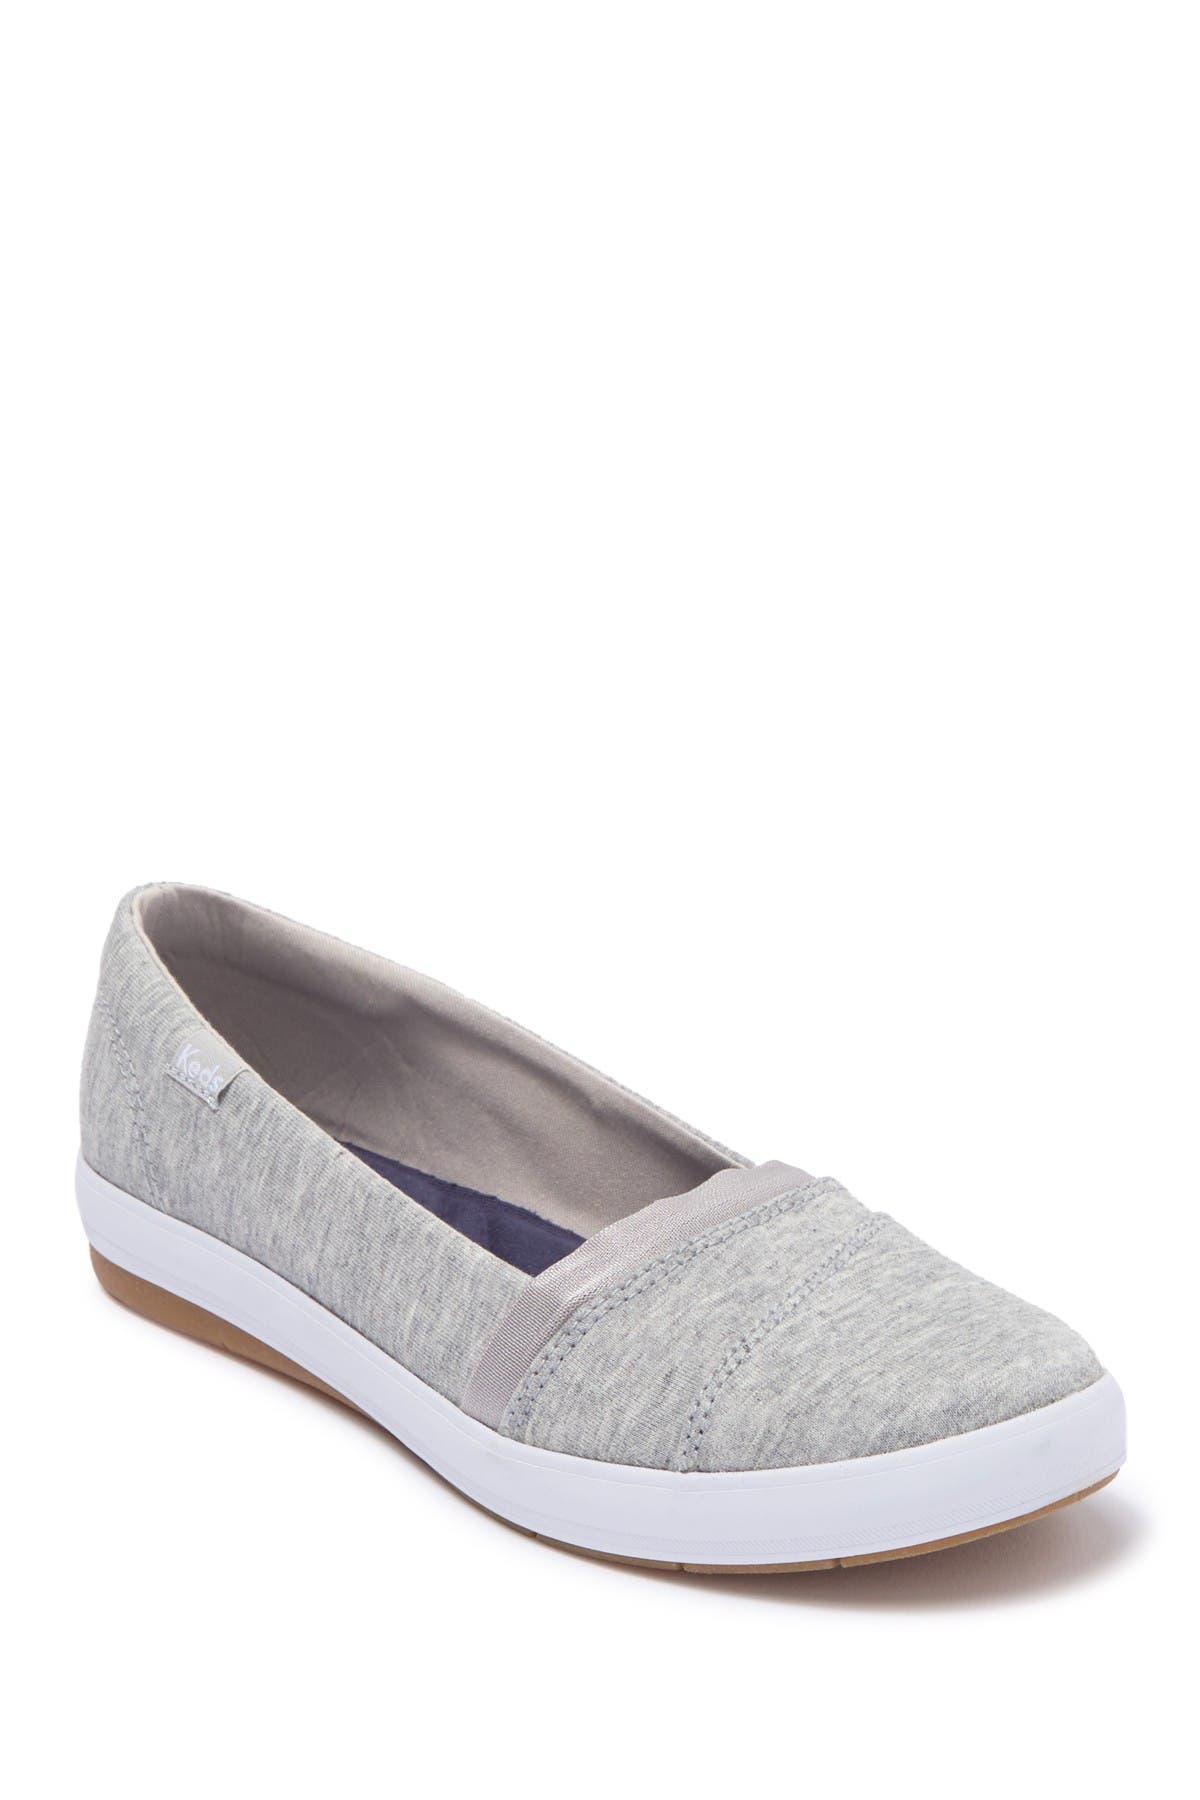 Keds | Carmel Jersey Slip-On Sneaker